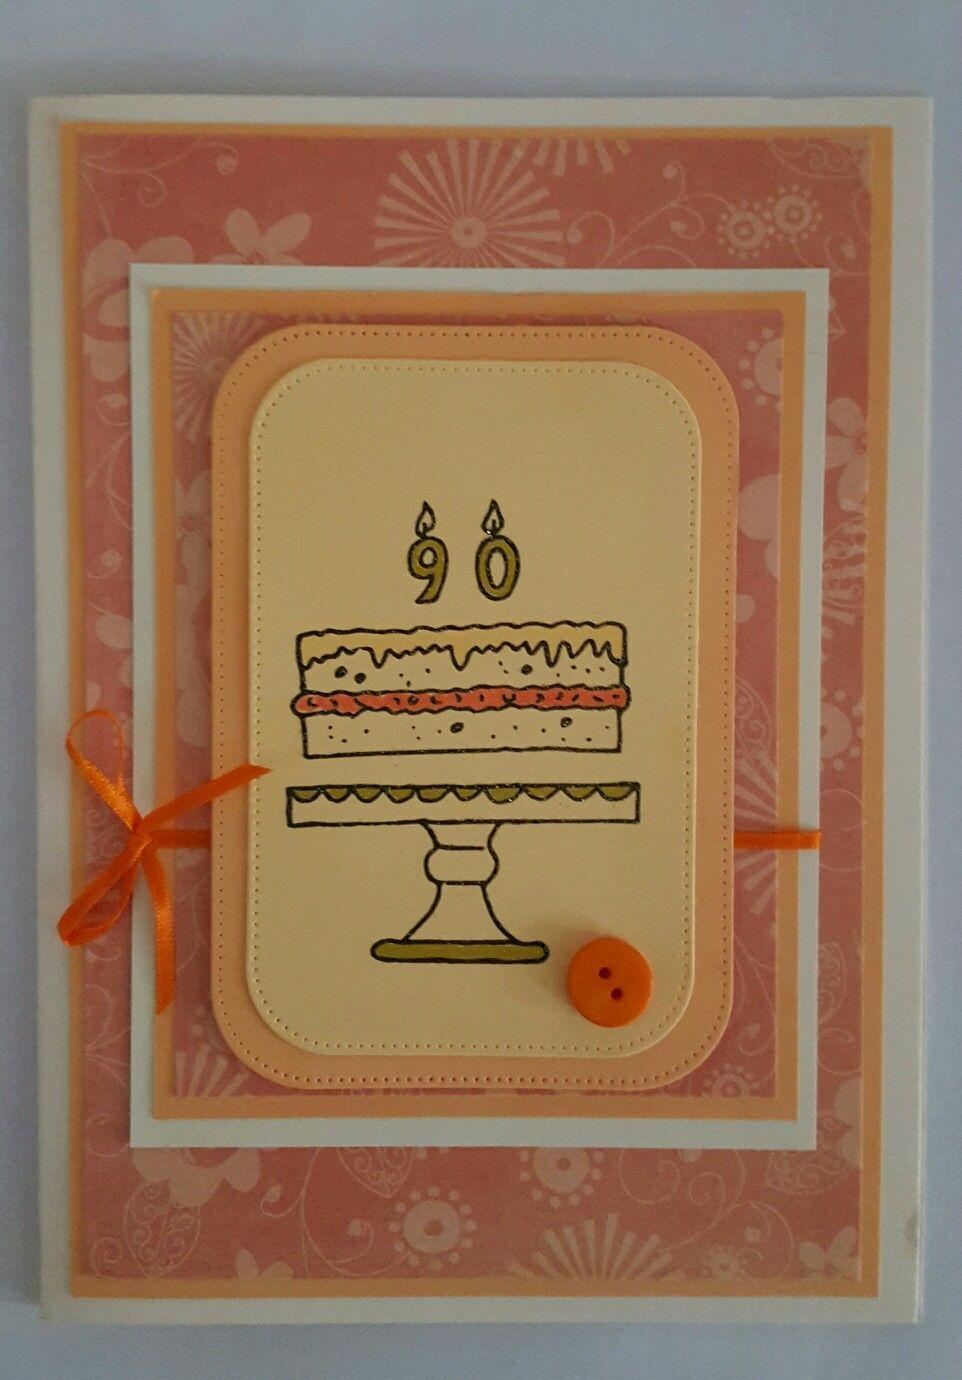 90 th birthday card 90th birthday cards, Birthday cards